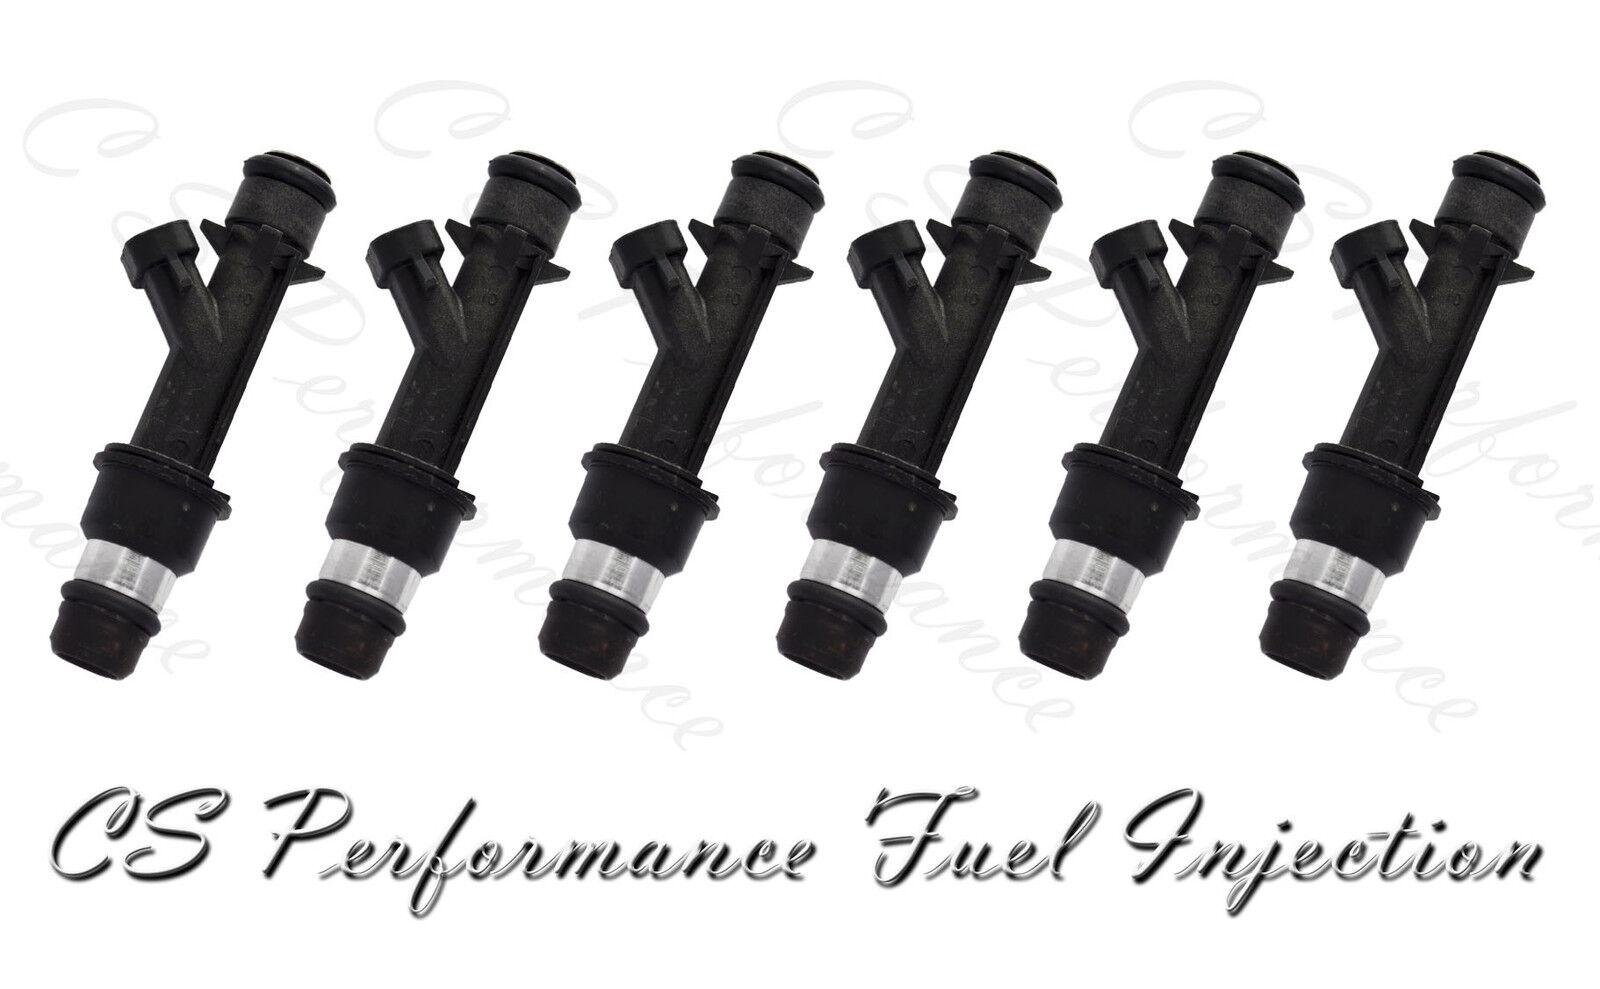 OEM Delphi Fuel Injector 1 25166922 Rebuilt by Master ASE Mechanic USA